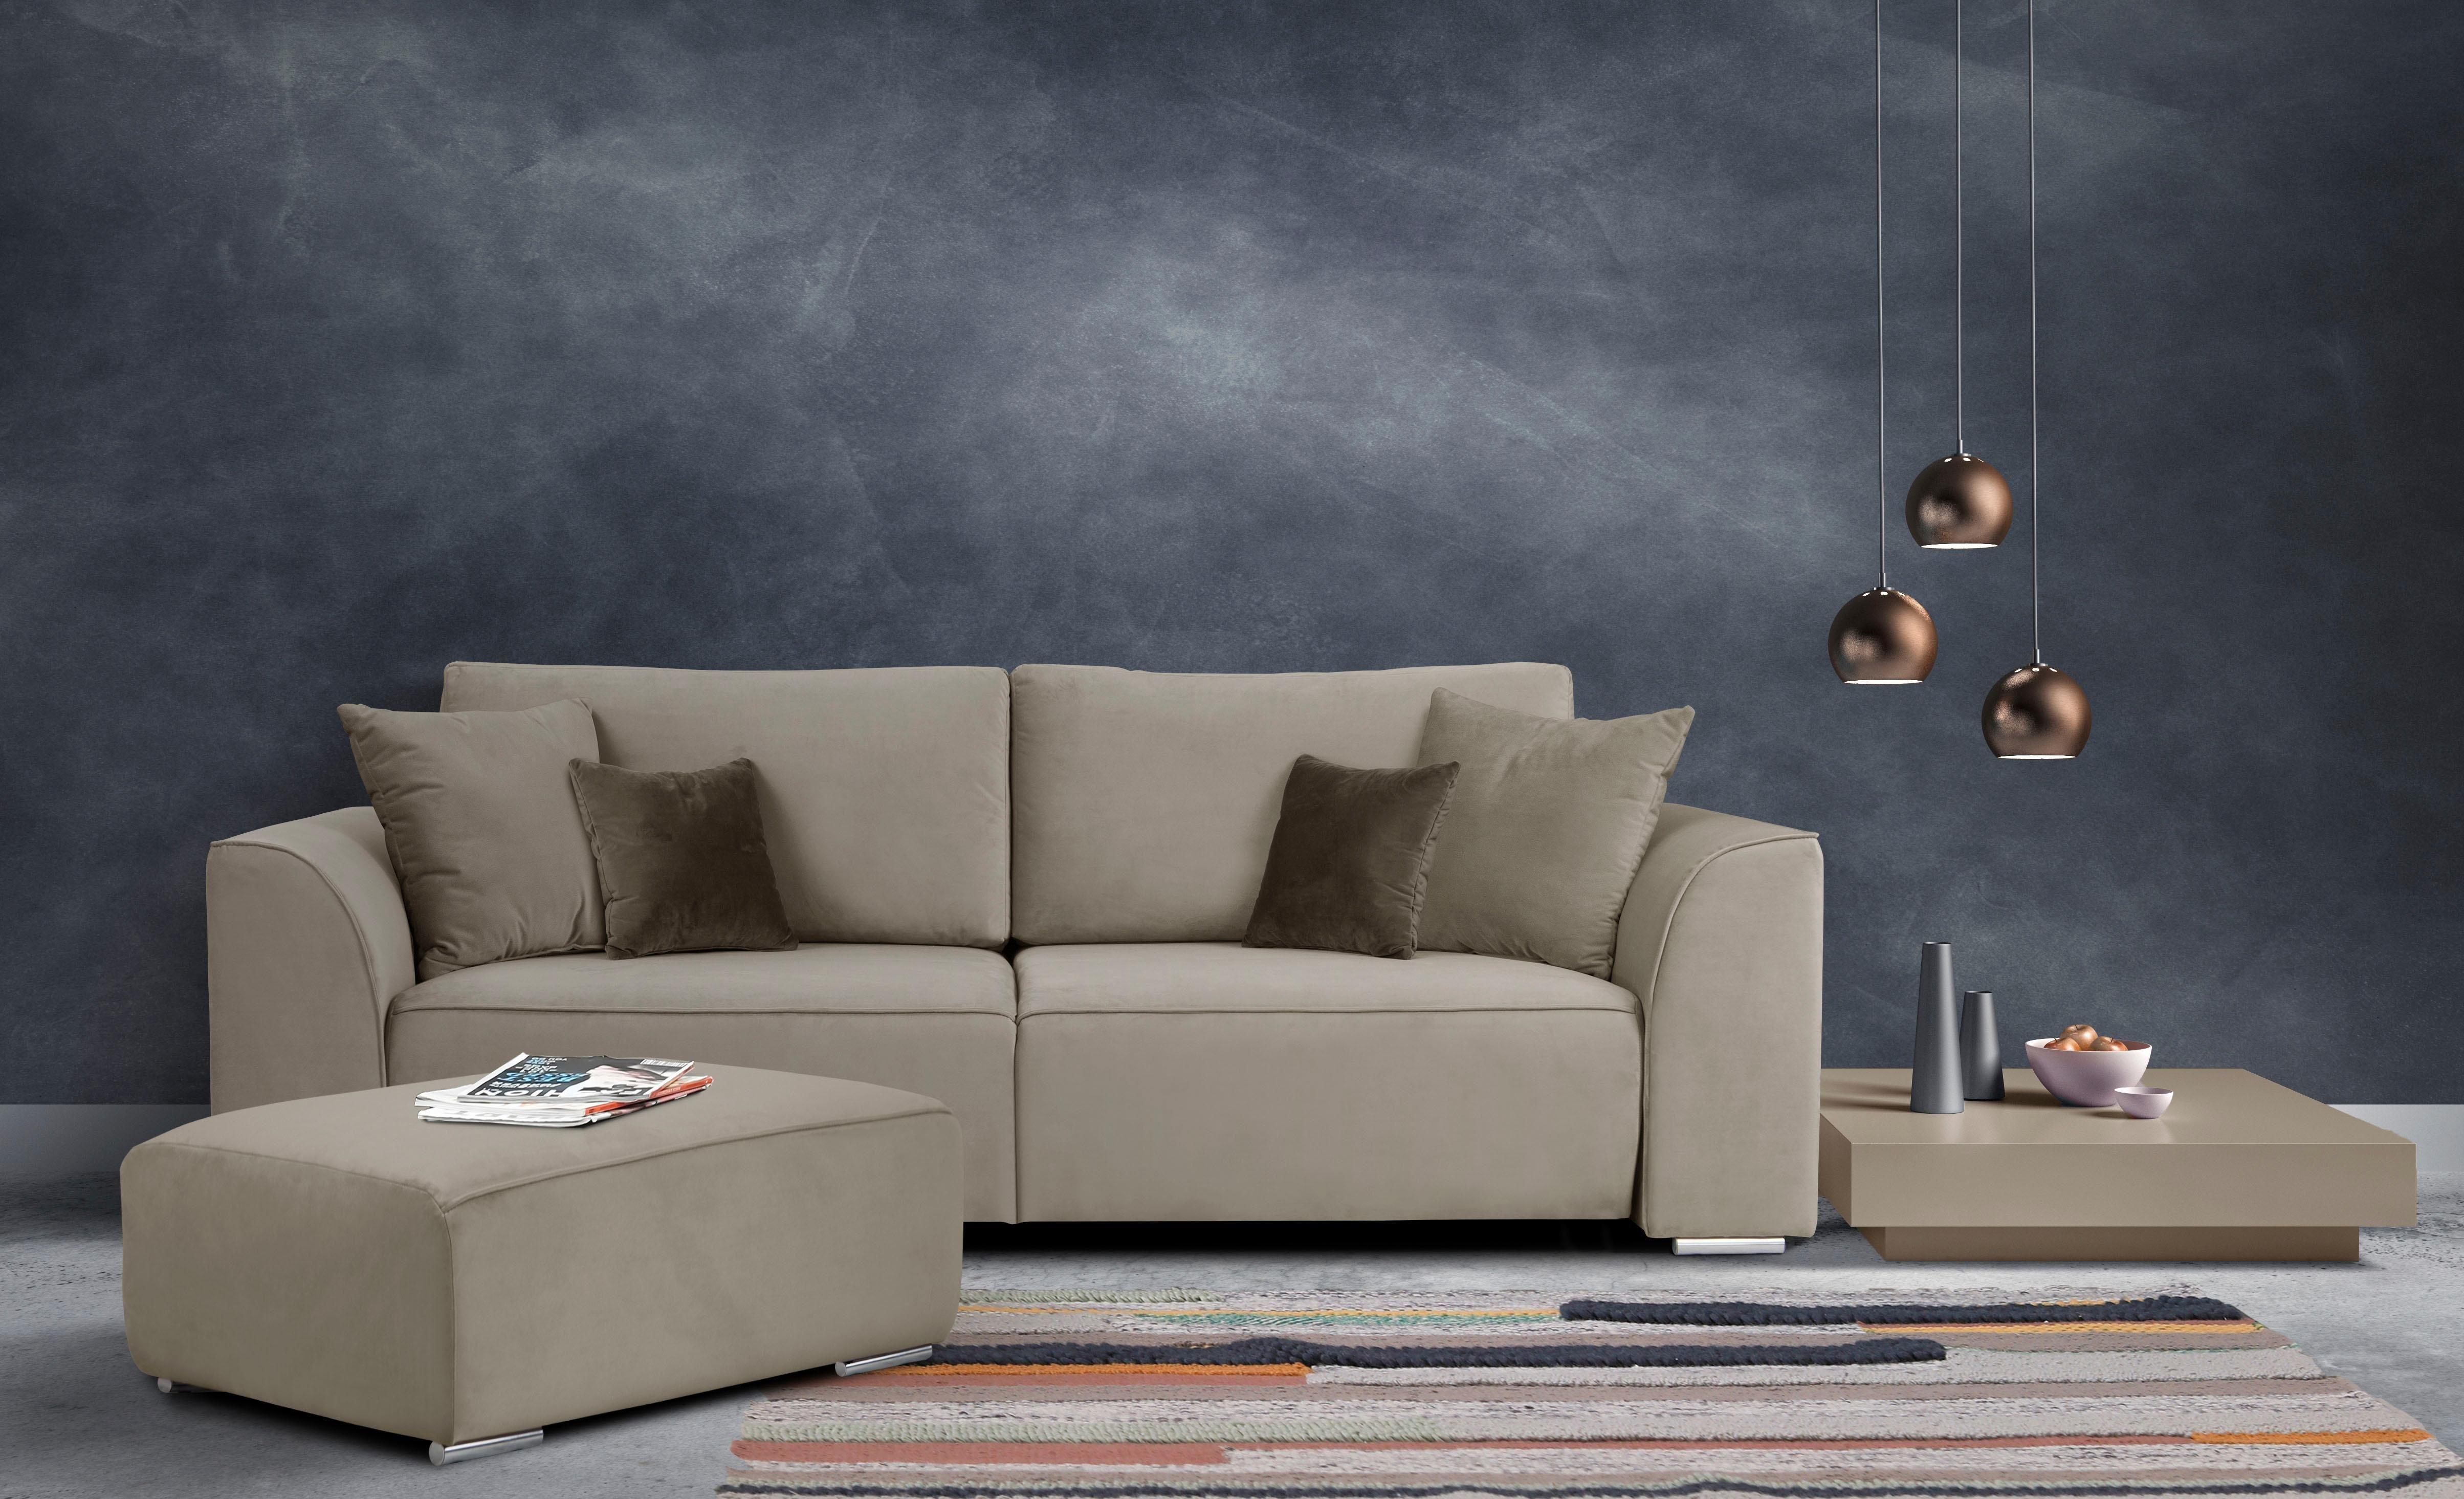 Inosign 3 Sitzer Beatrice In 2020 Design Schlafsofa Haus Deko 3 Sitzer Sofa